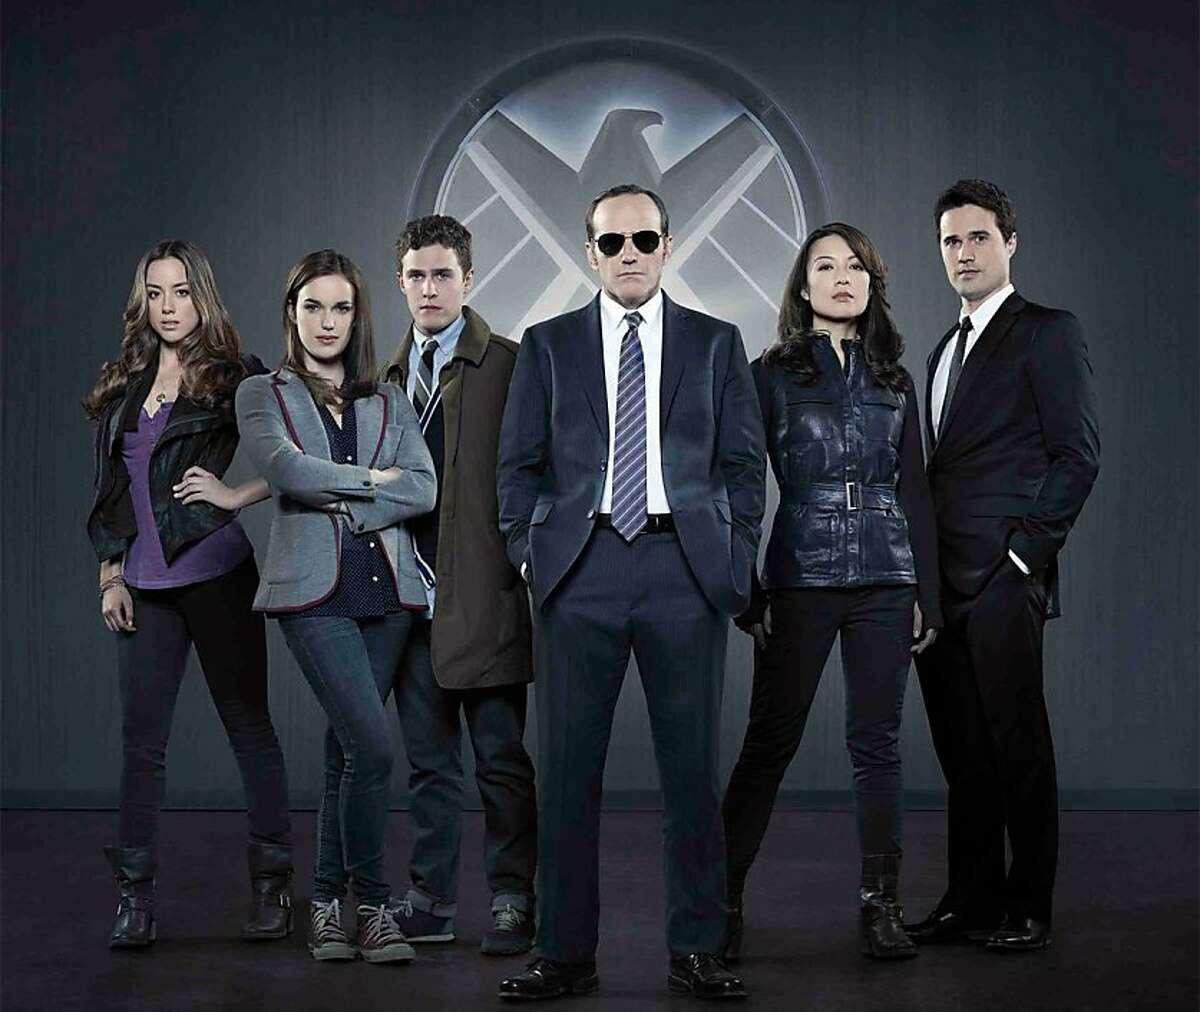 Chloe Bennet, Elizabeth Henstridge, Iain De Caestecker, Clark Gregg, Ming-Na Wen, Brett Dalton, in Agents of S.H.I.E.L.D.